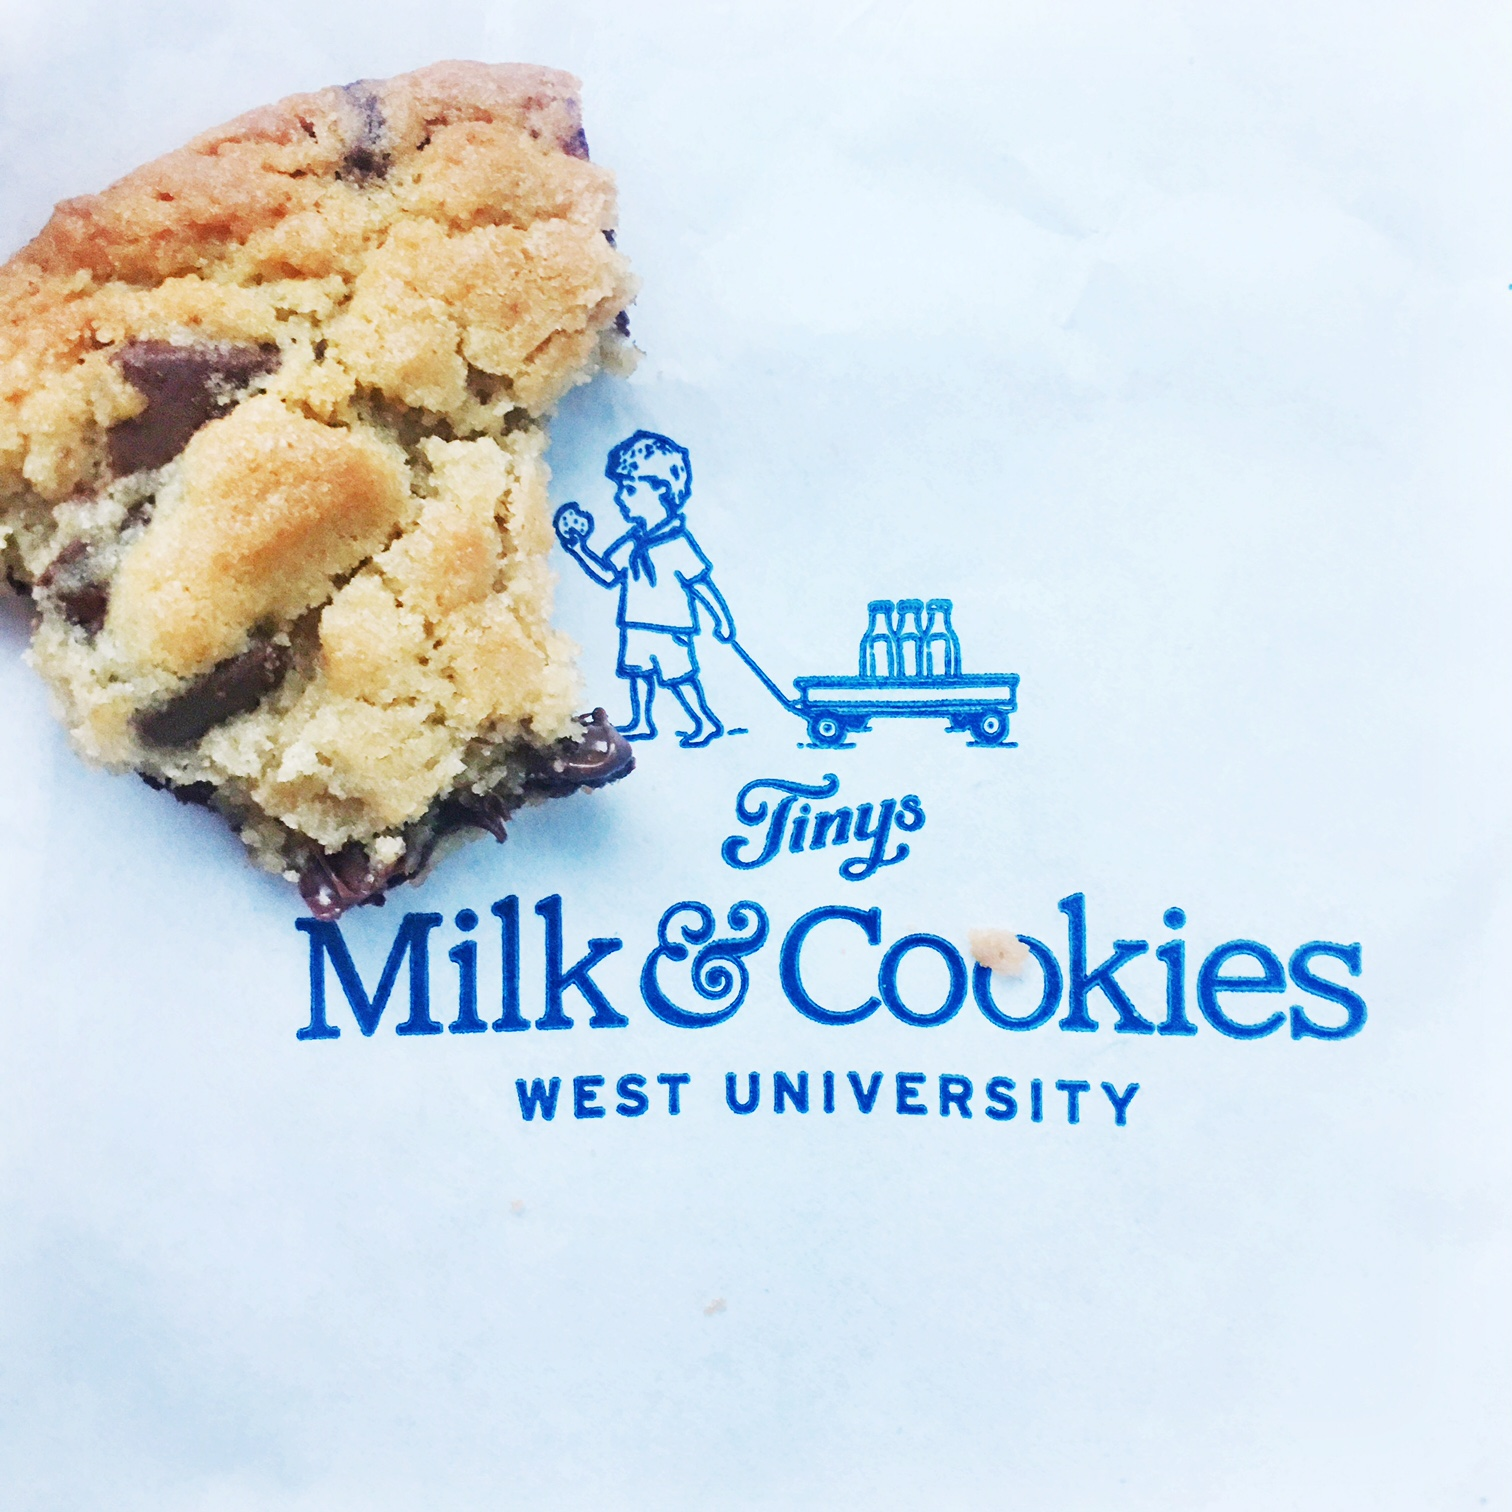 Tinys Milk & Cookies 1.JPG